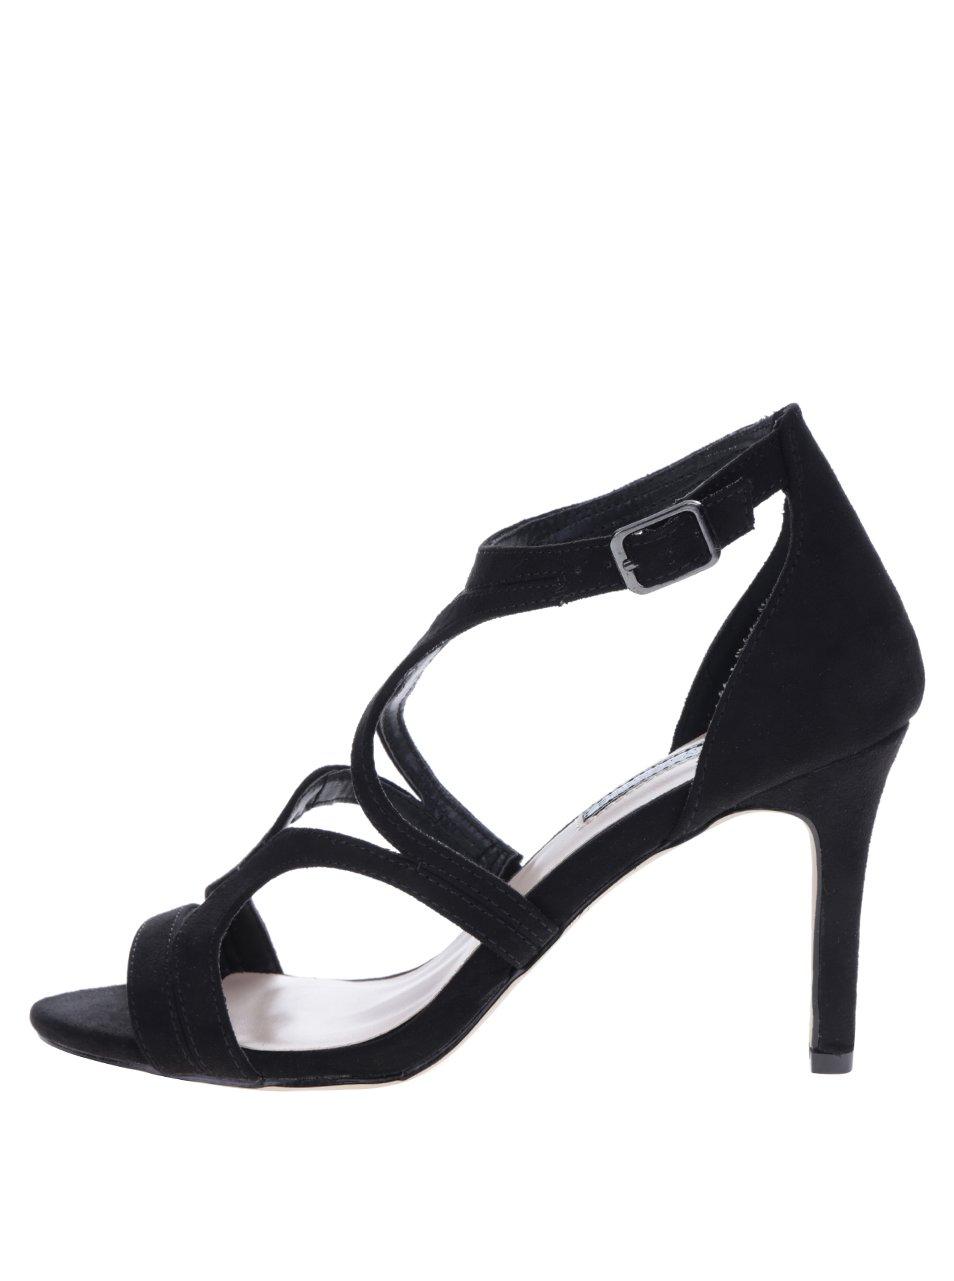 Černé páskové sandálky v semišové úpravě Dorothy Perkins